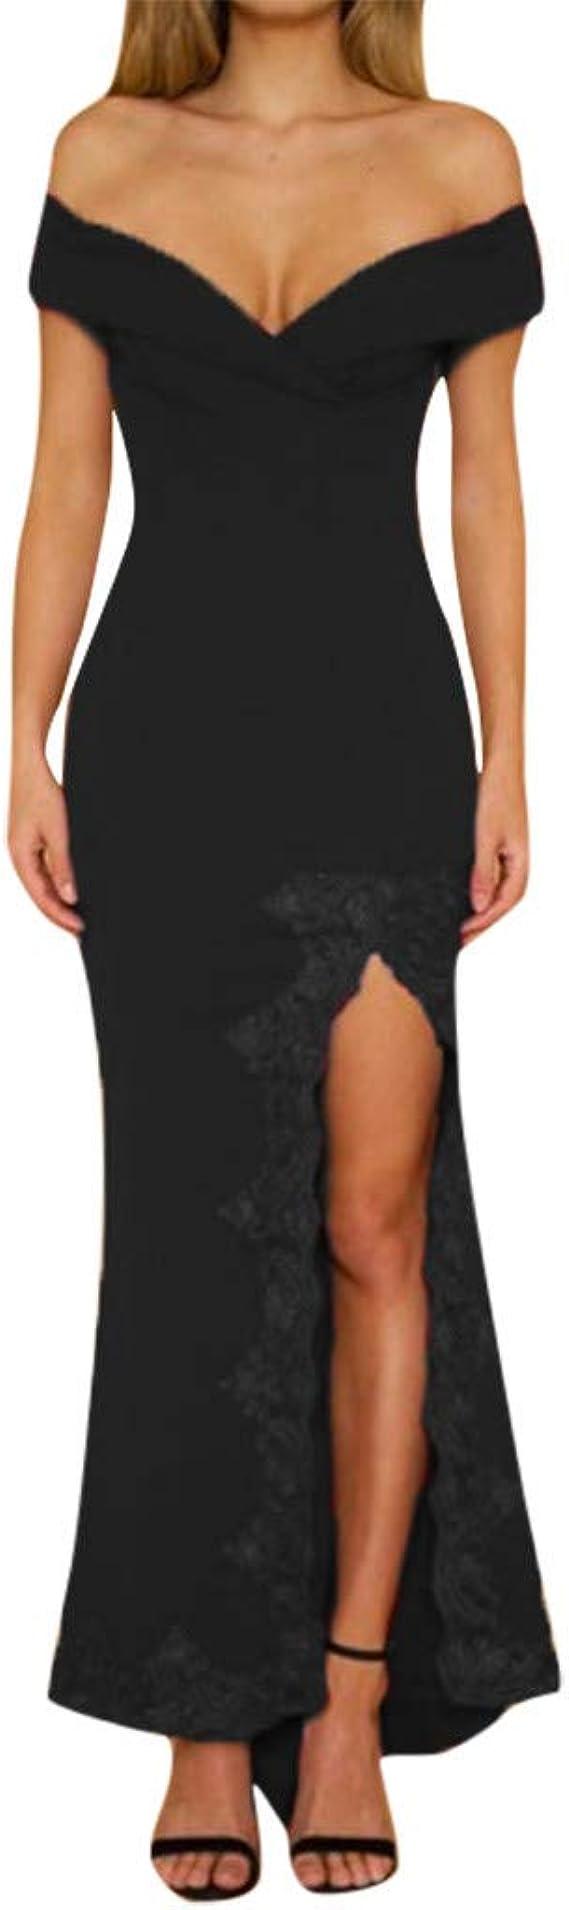 Babaseal Womens Dress Crew Neck Long Sleeve One Shoulder Bodycon Split Dress